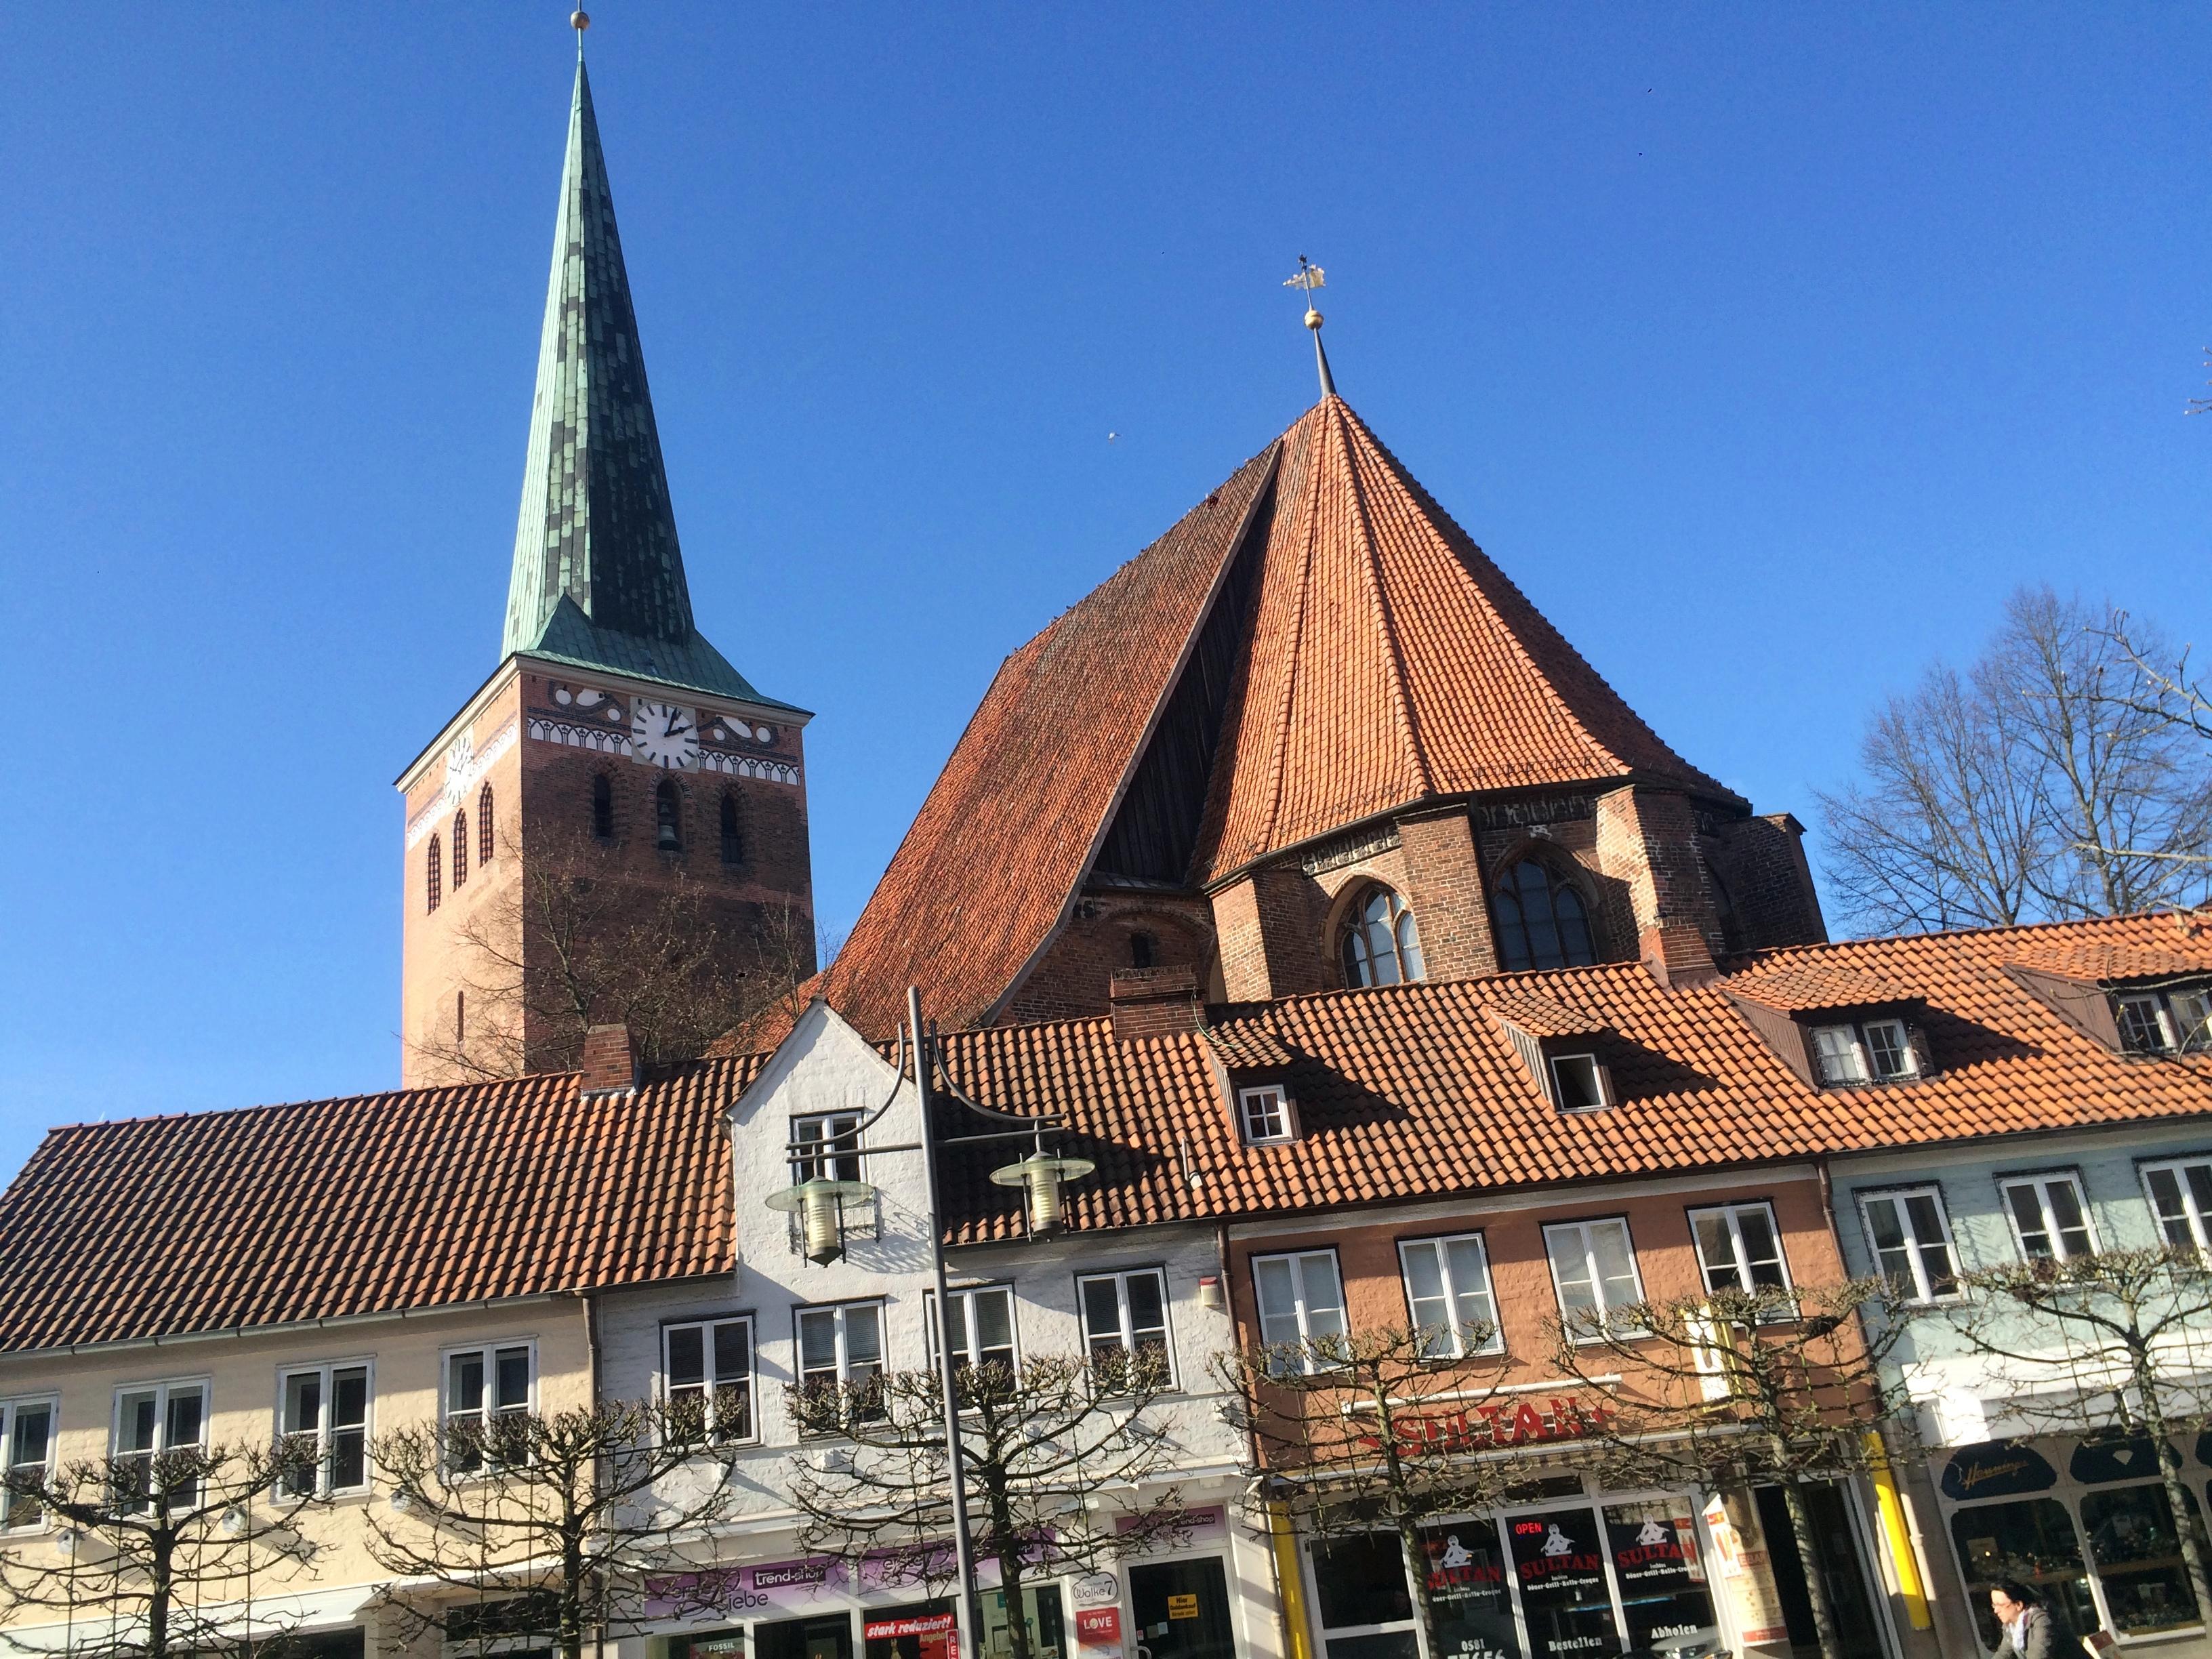 Datei:St.-Marien-Kirche Uelzen.JPG - Wikipedia